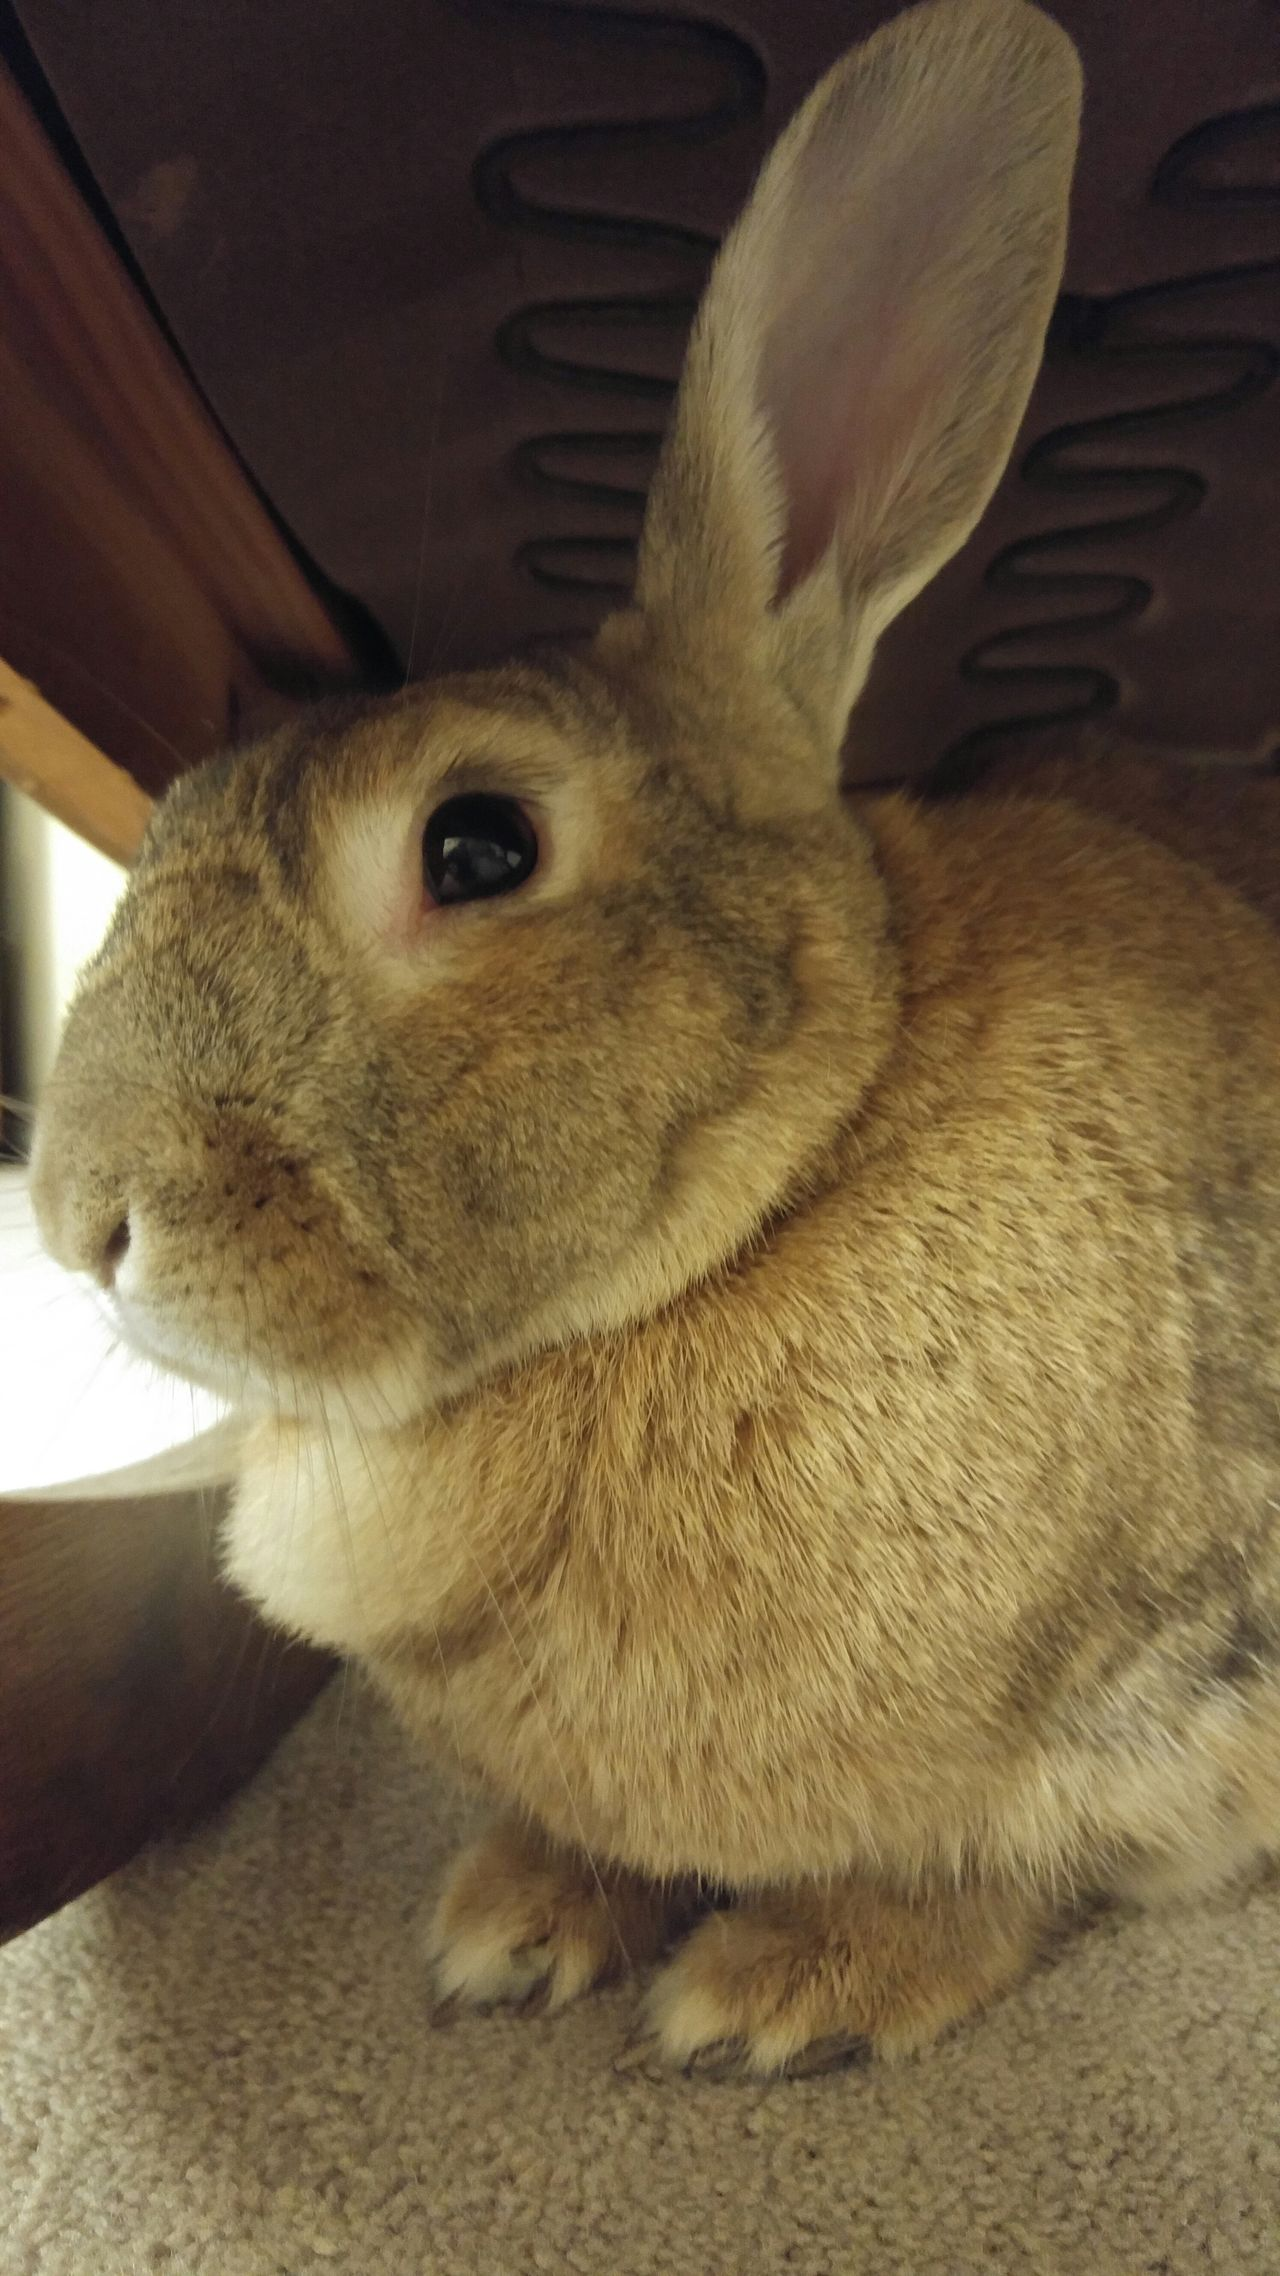 Rabbit Rabbit ❤️ Rabbits 🐇 Pets ricaedo the rabbit